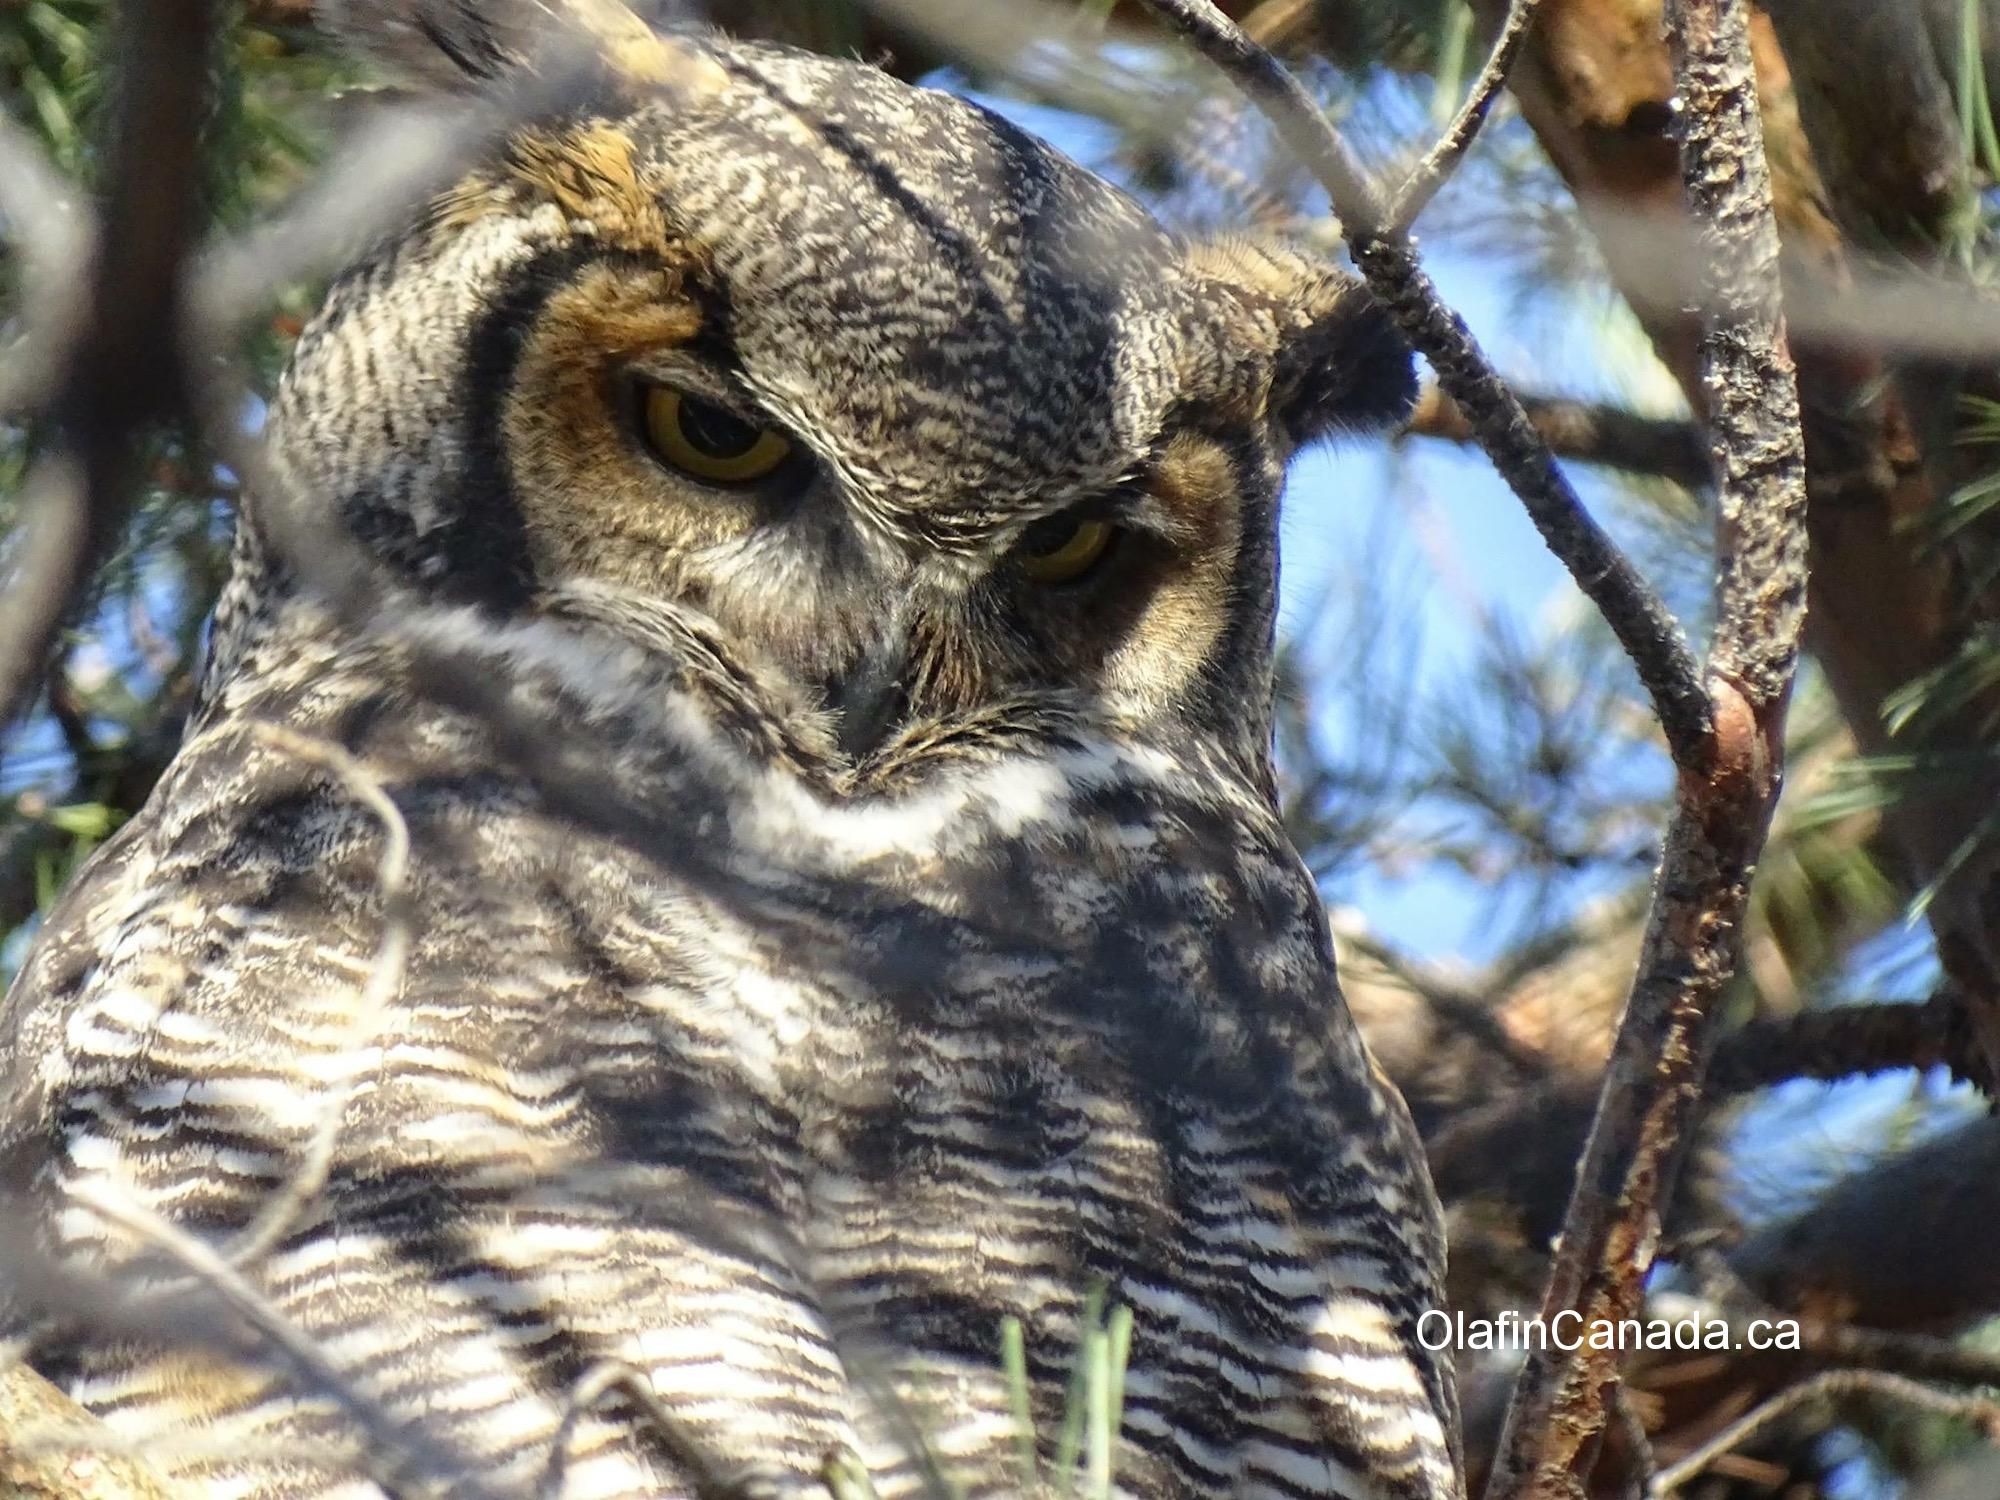 Great horned owl in downtown Kelowna #olafincanada #britishcolumbia #discoverbc #wildlife #greathornedowl